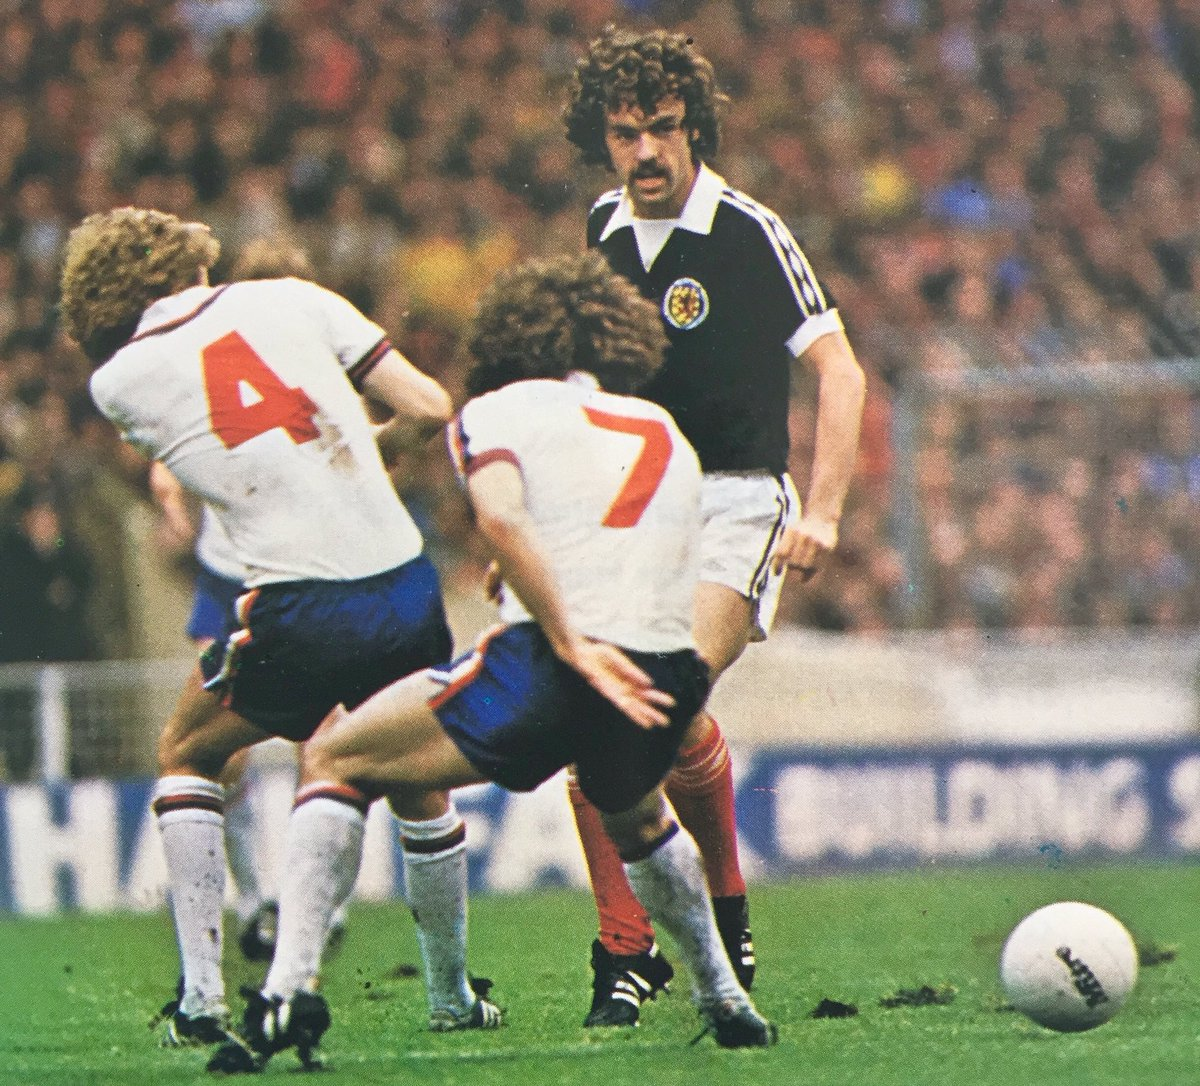 Perm any 2 from 3 Phil Thompson & Kevin Keegan v John Wark - England v Scotland OTD 26/5/79 #ENG #SCO #LFC #ITFC #HSV